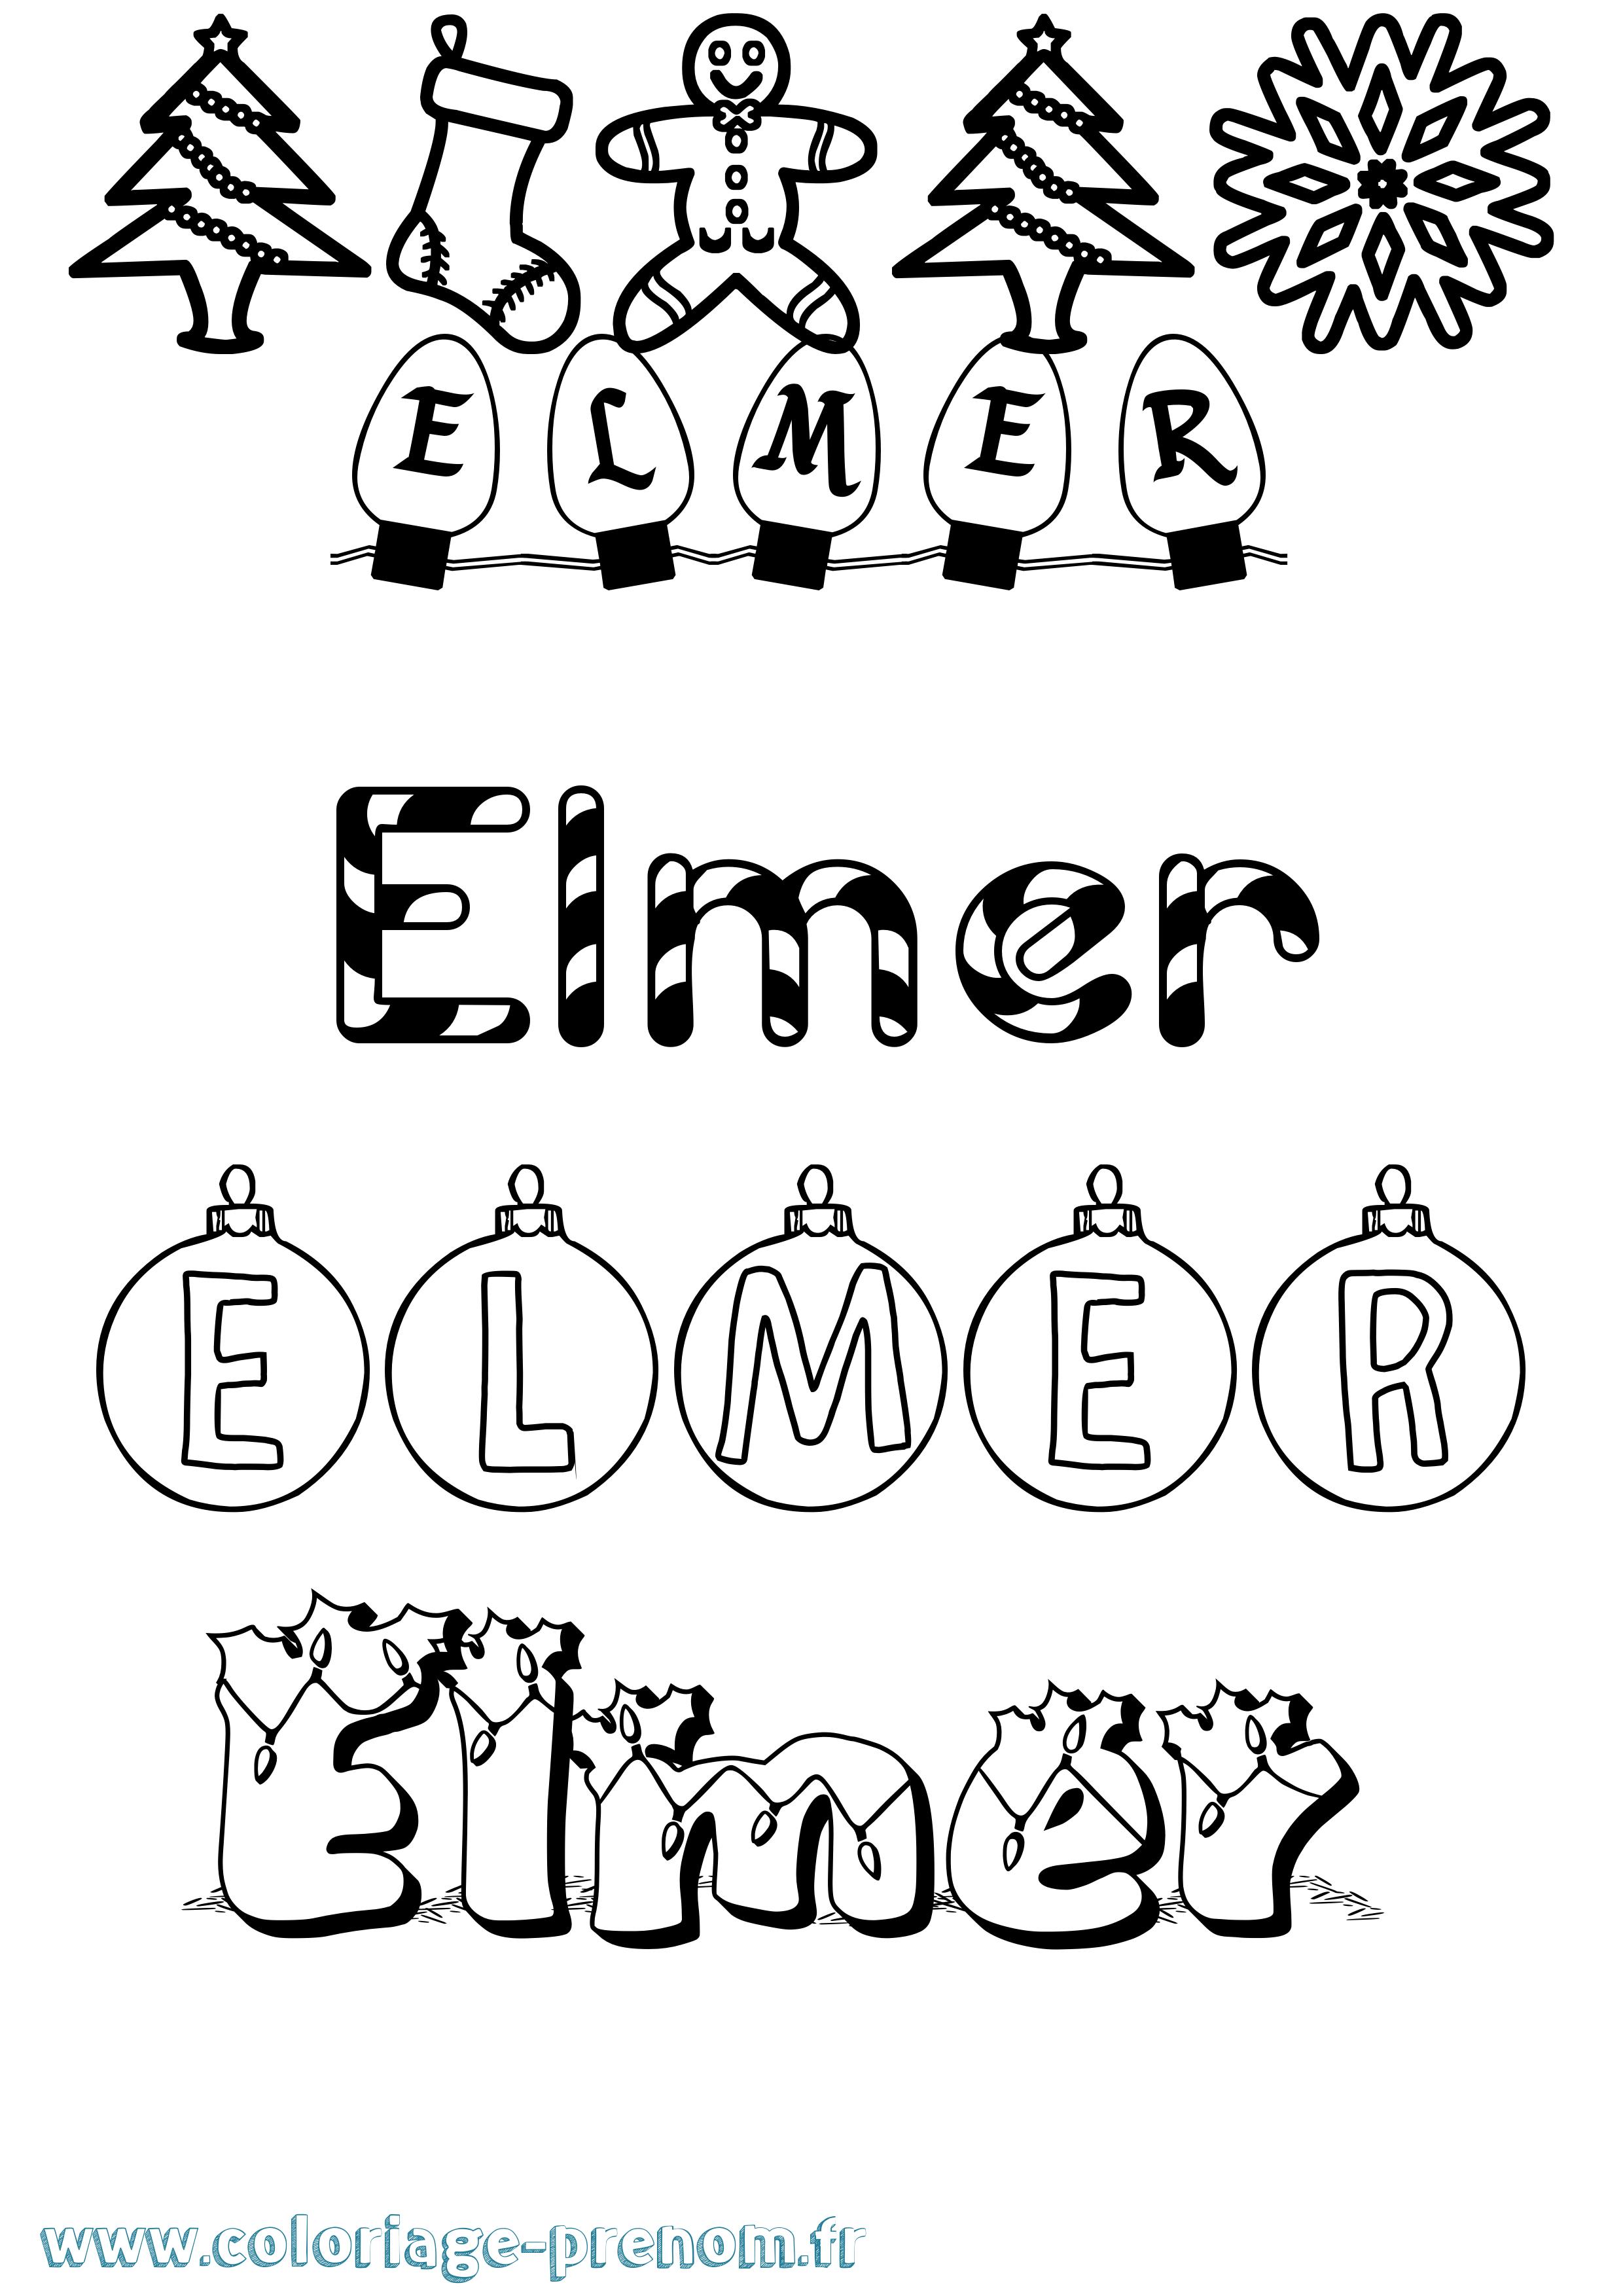 Coloriage Elmer A Imprimer.Coloriage Du Prenom Elmer A Imprimer Ou Telecharger Facilement